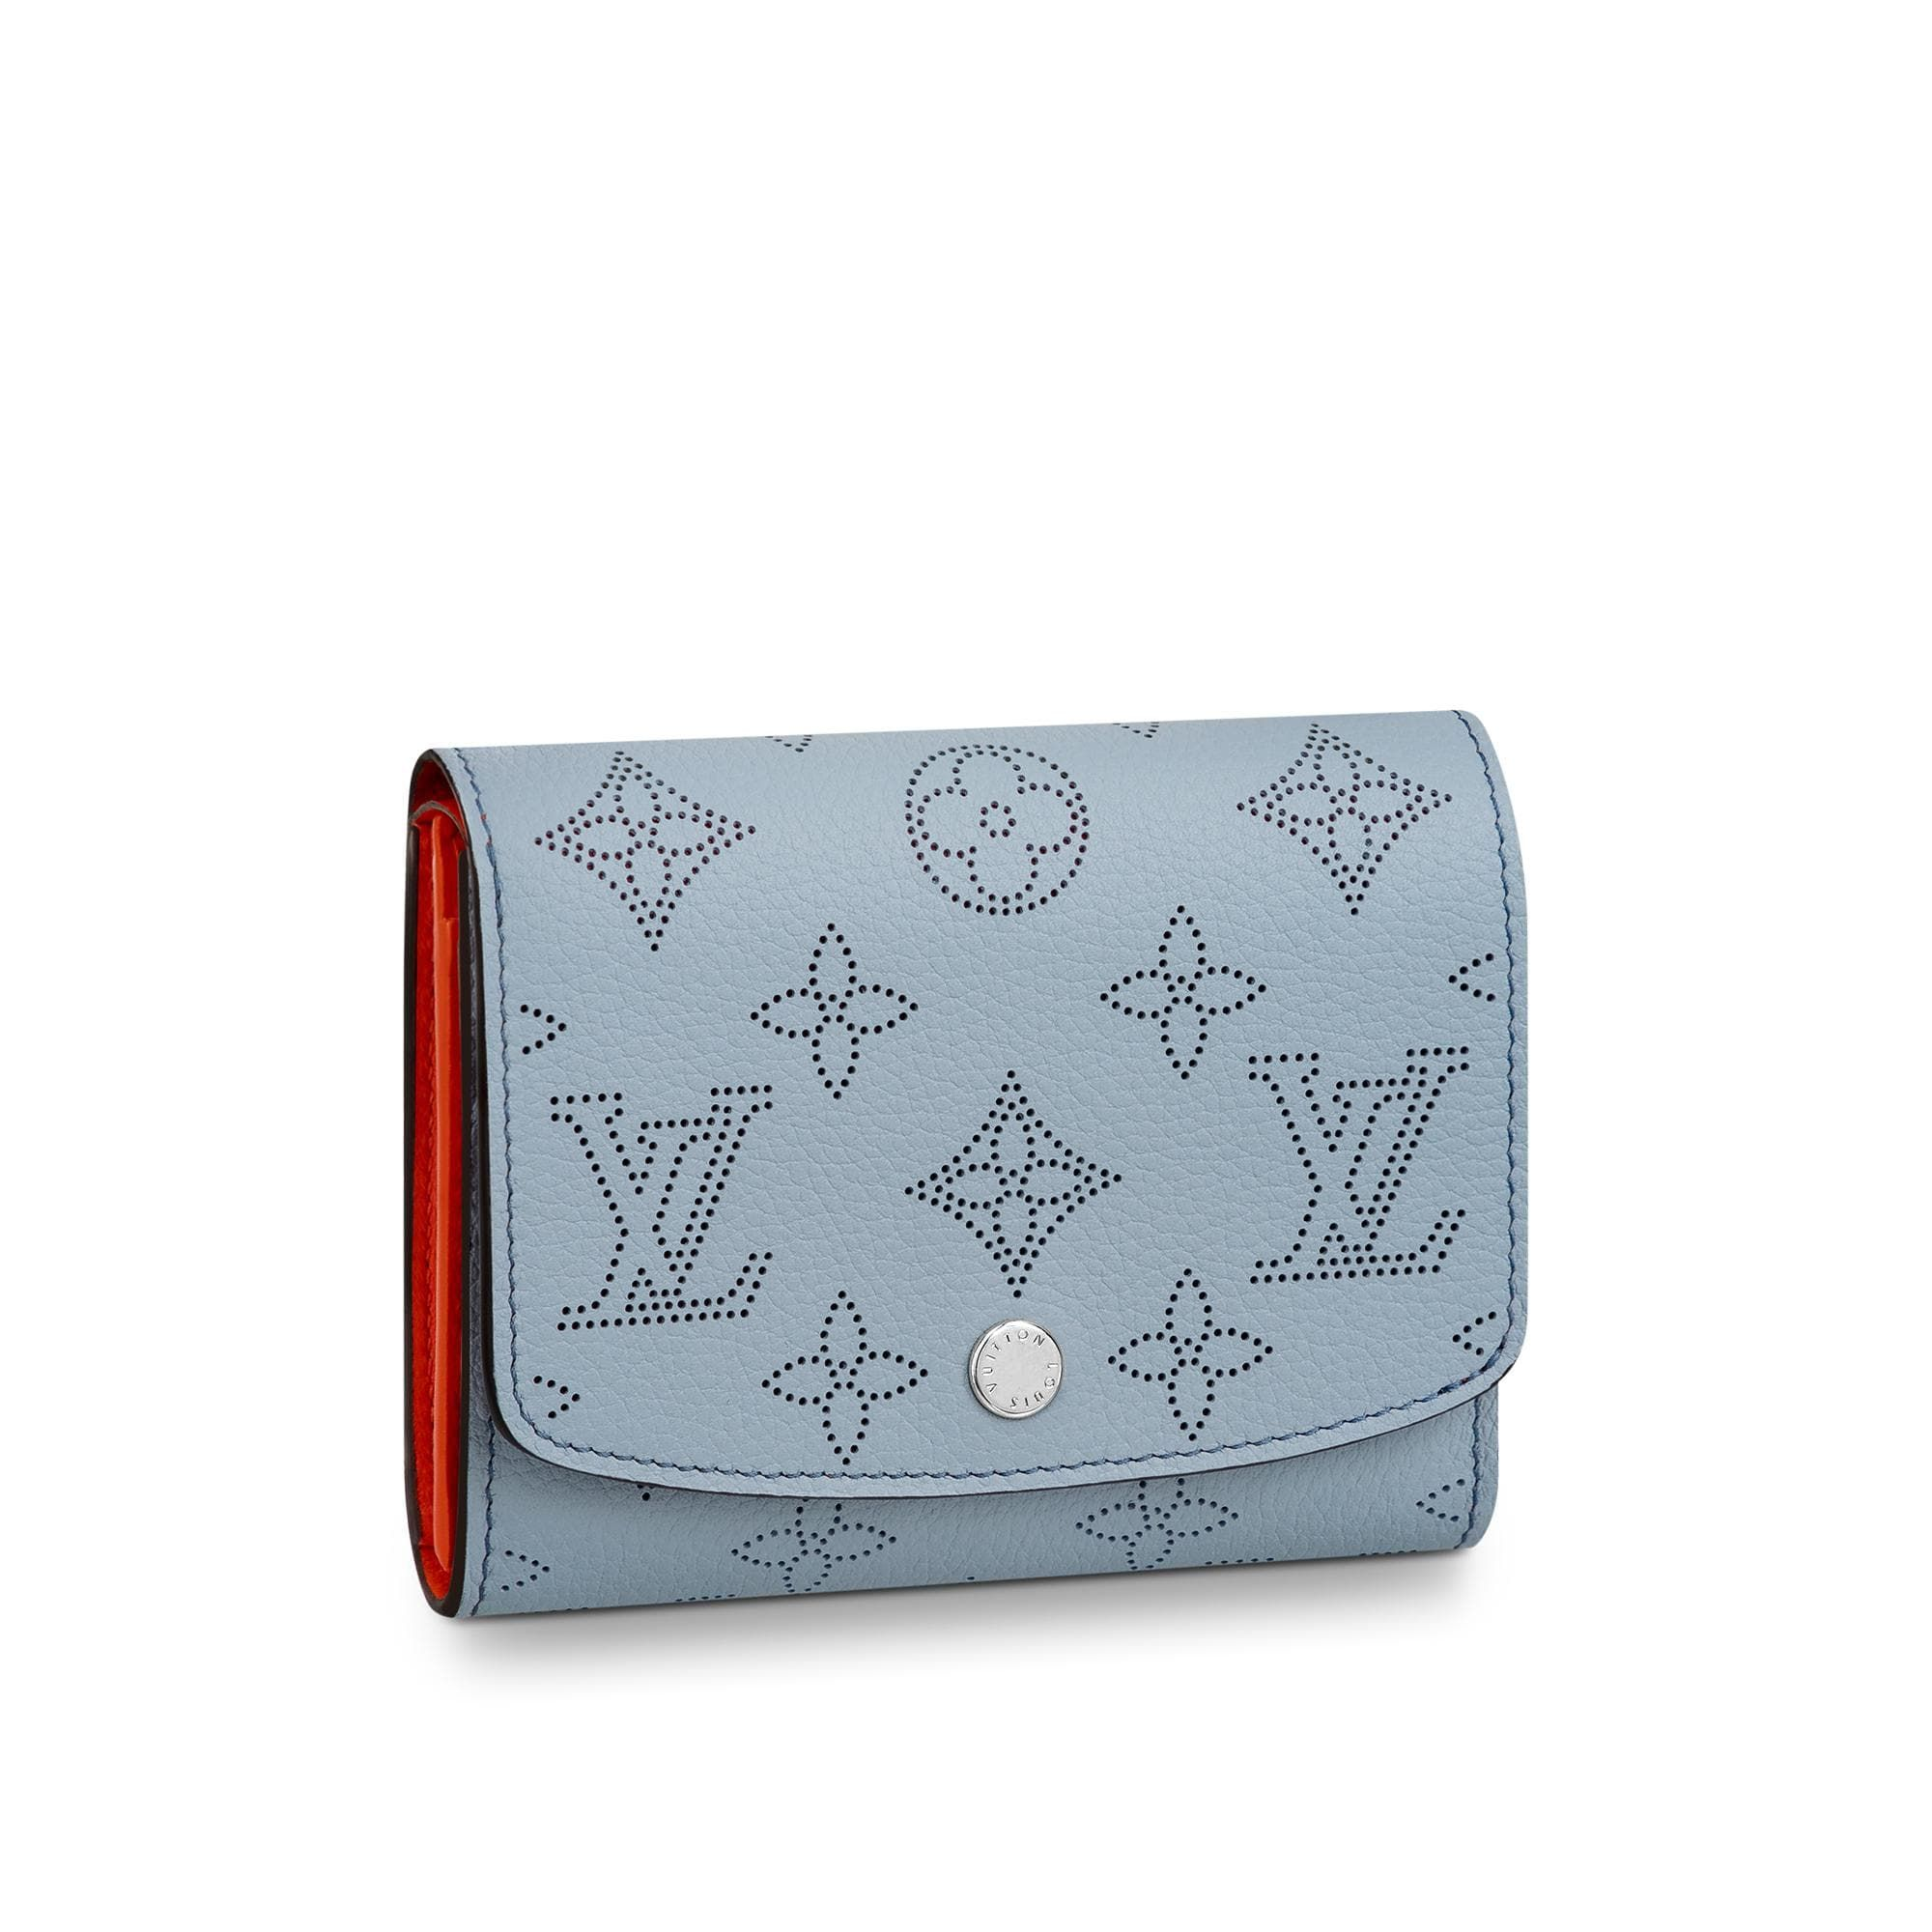 c25fa5fb9 Iris Compact Wallet in 2019 | Bag Lady | Louis vuitton, Wallet, Bags